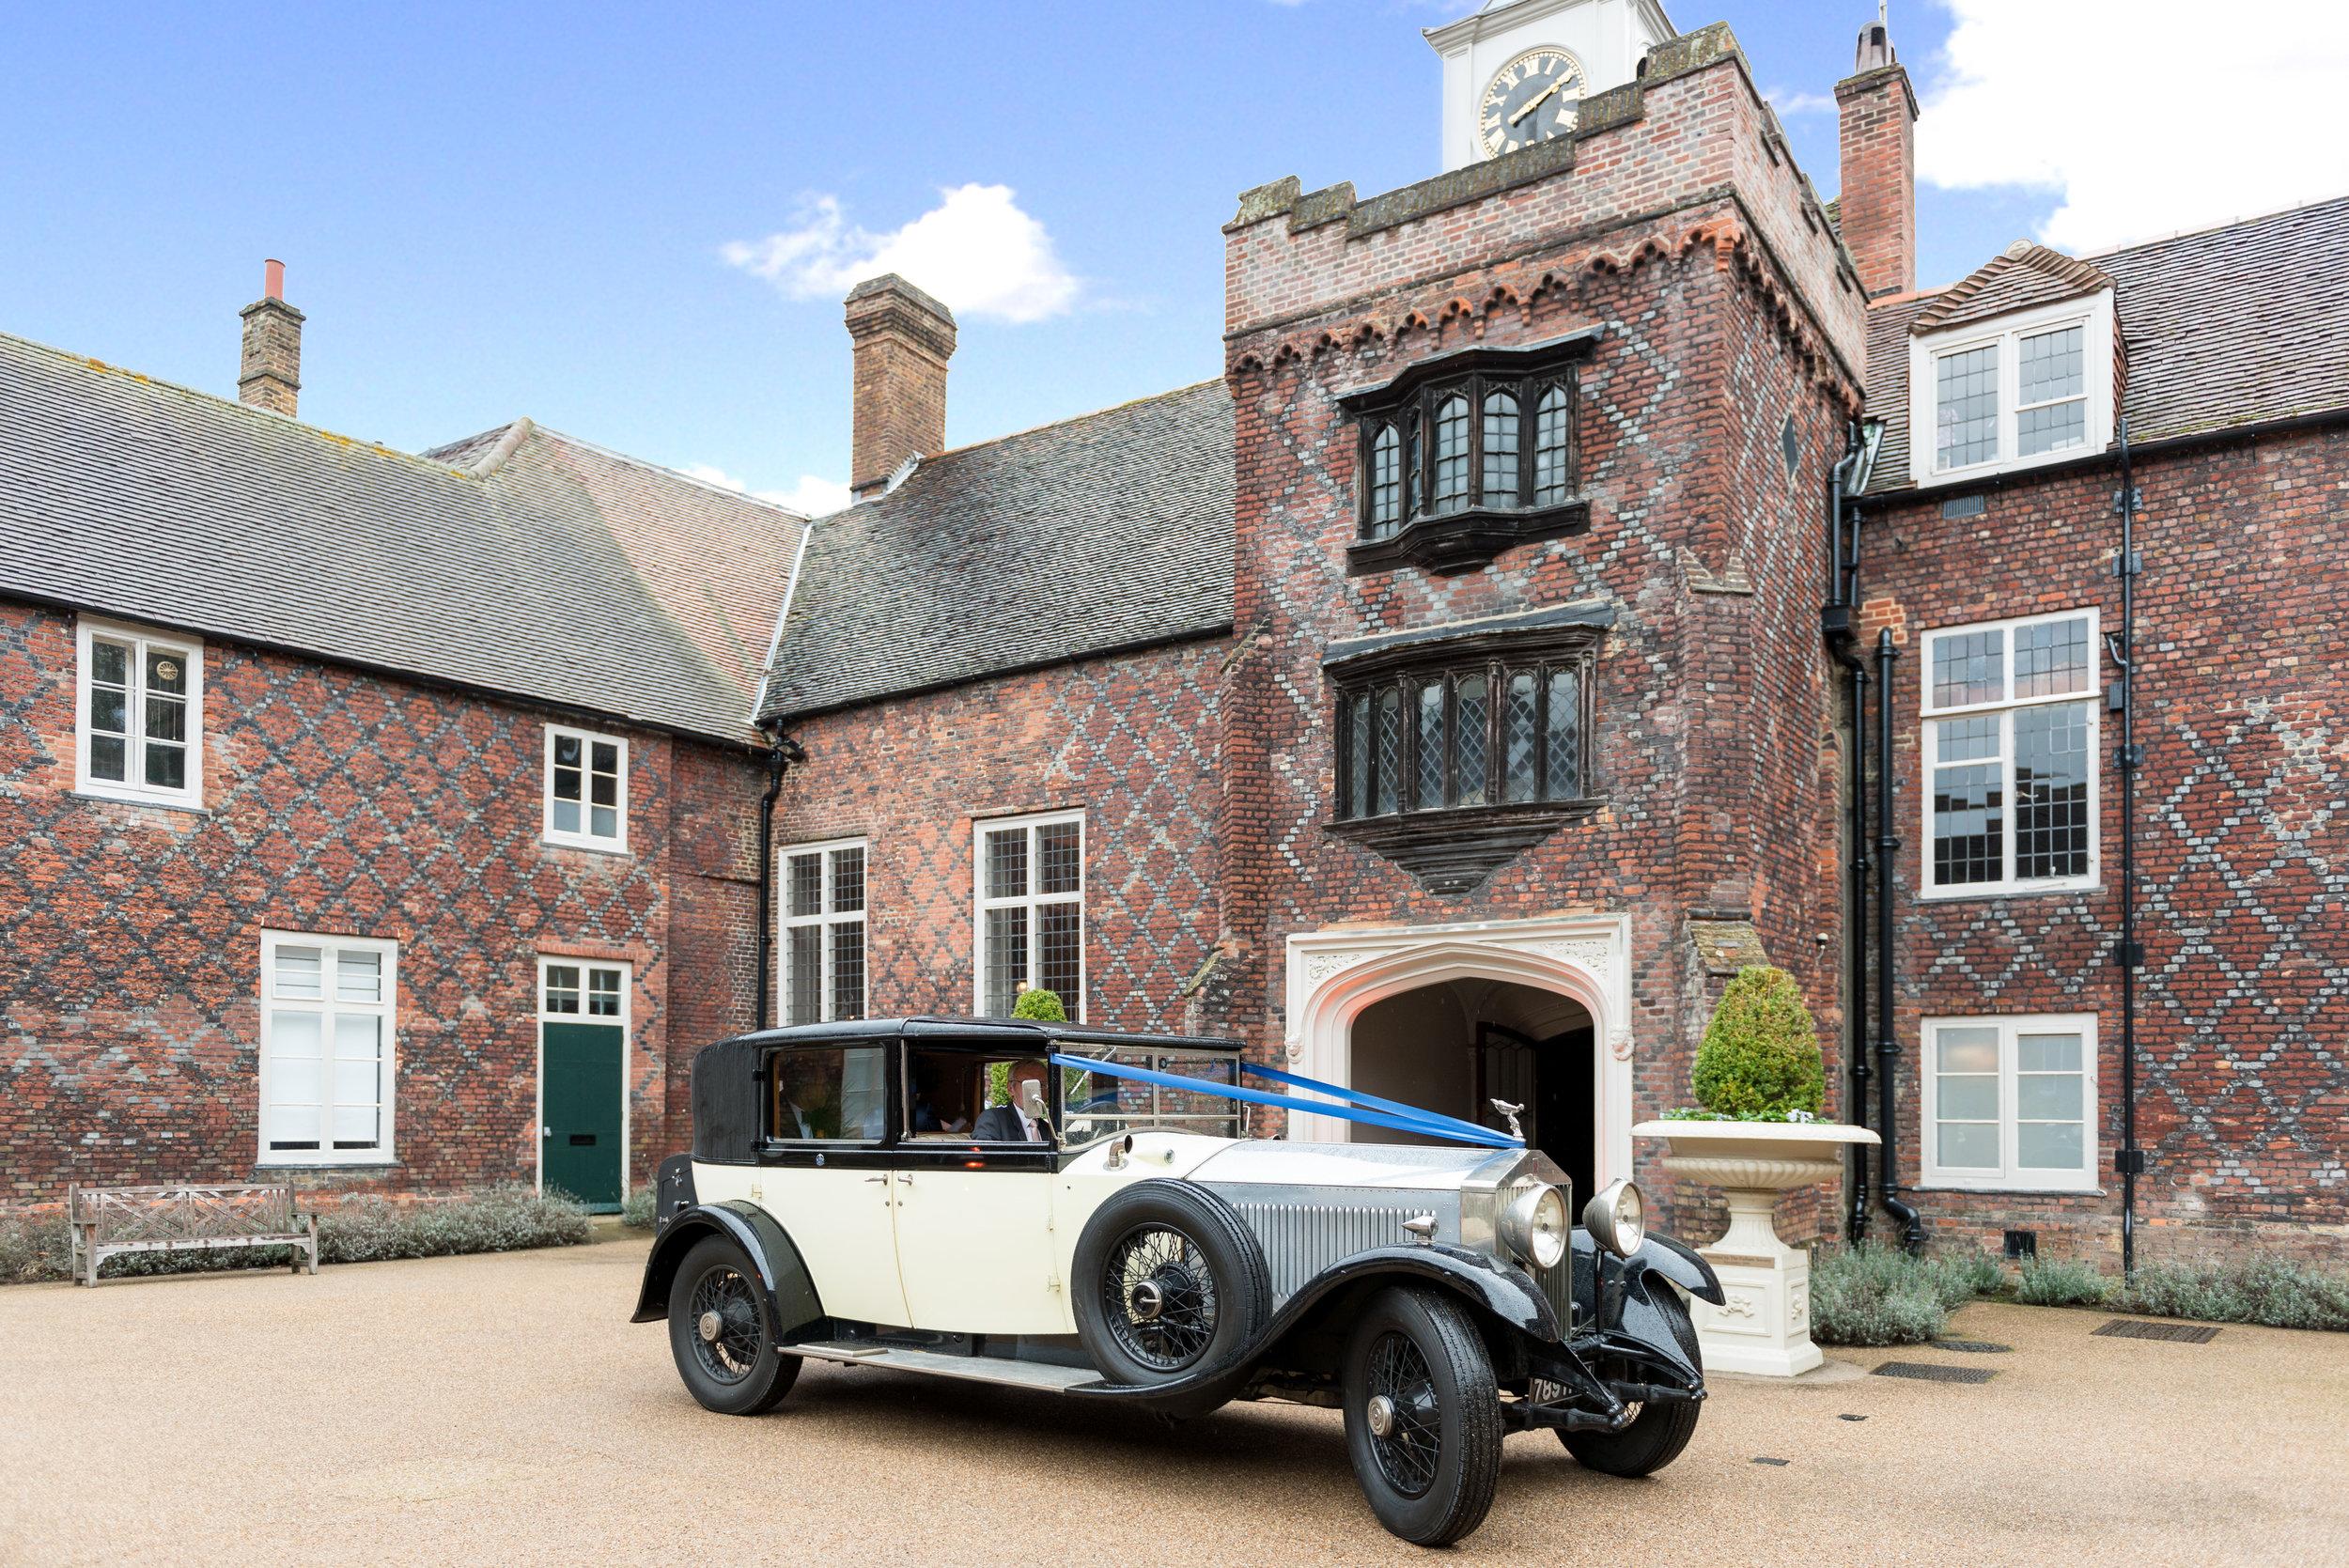 Classic-Car-Hire-Rolls-Royce-vintage.jpg